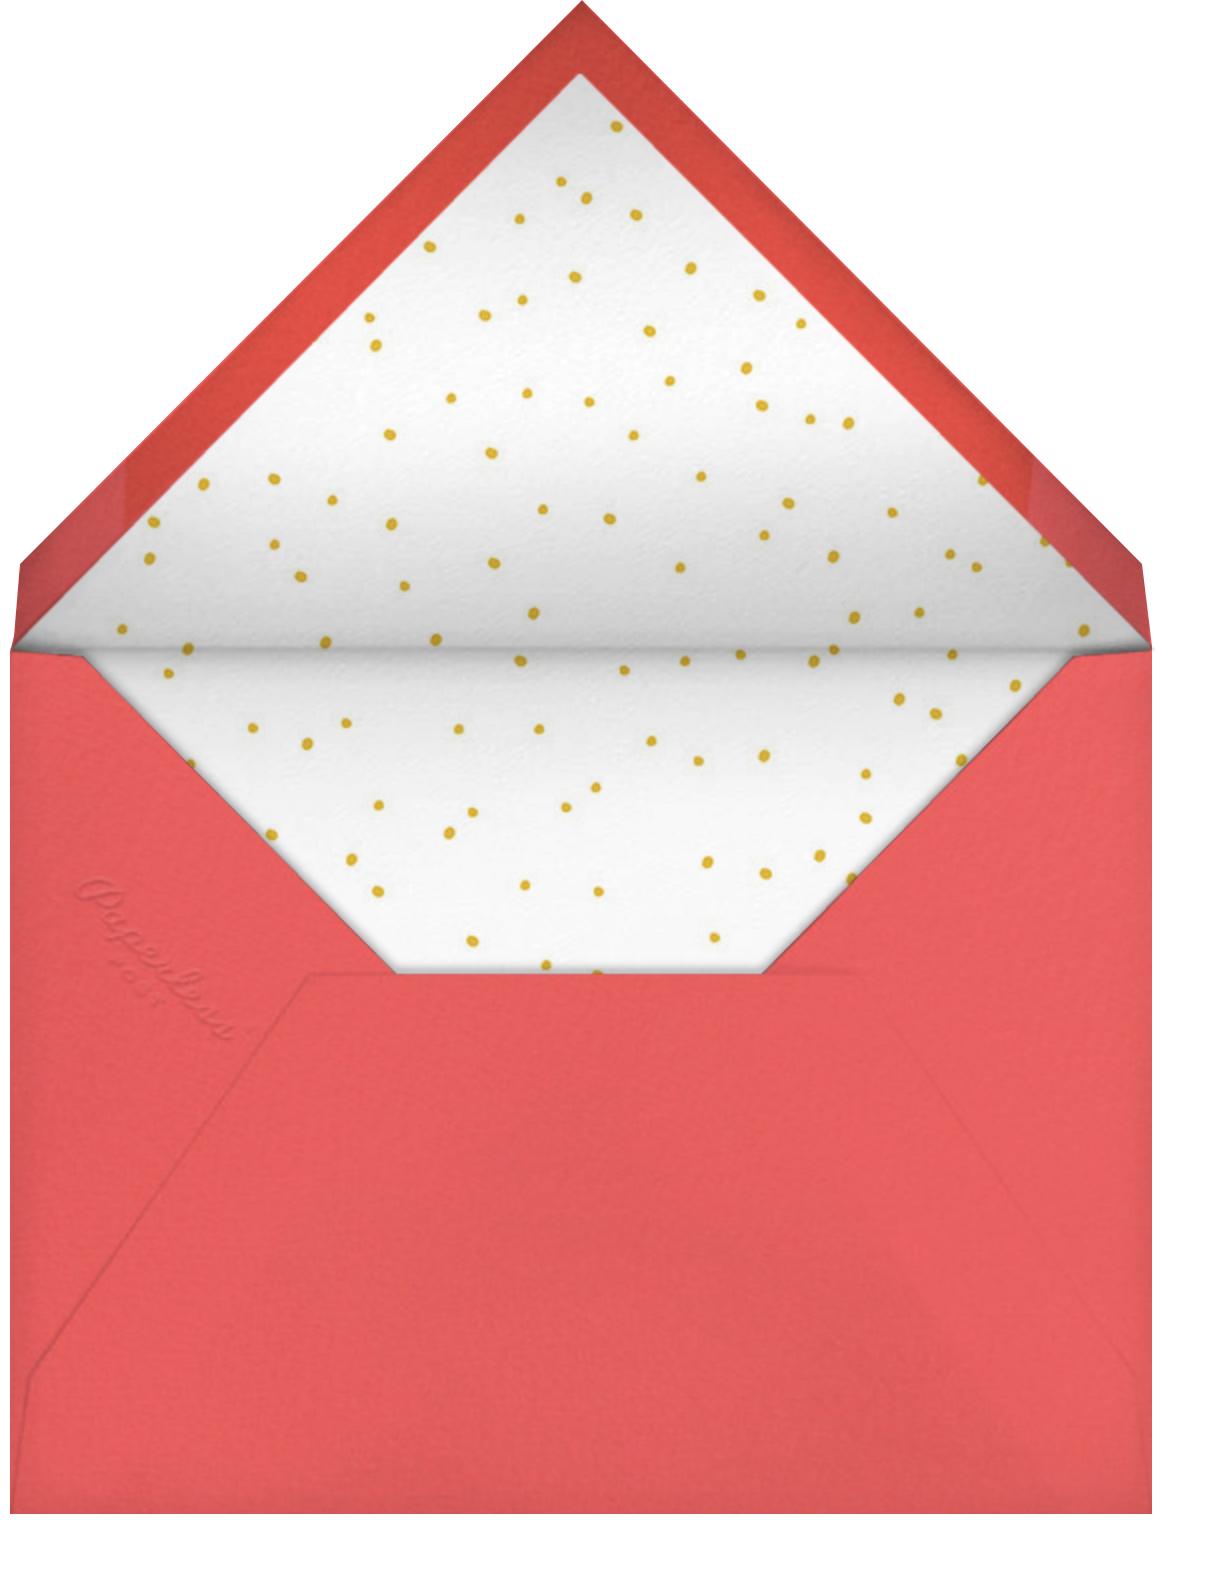 Bee Grand - Cheree Berry Paper & Design - Envelope